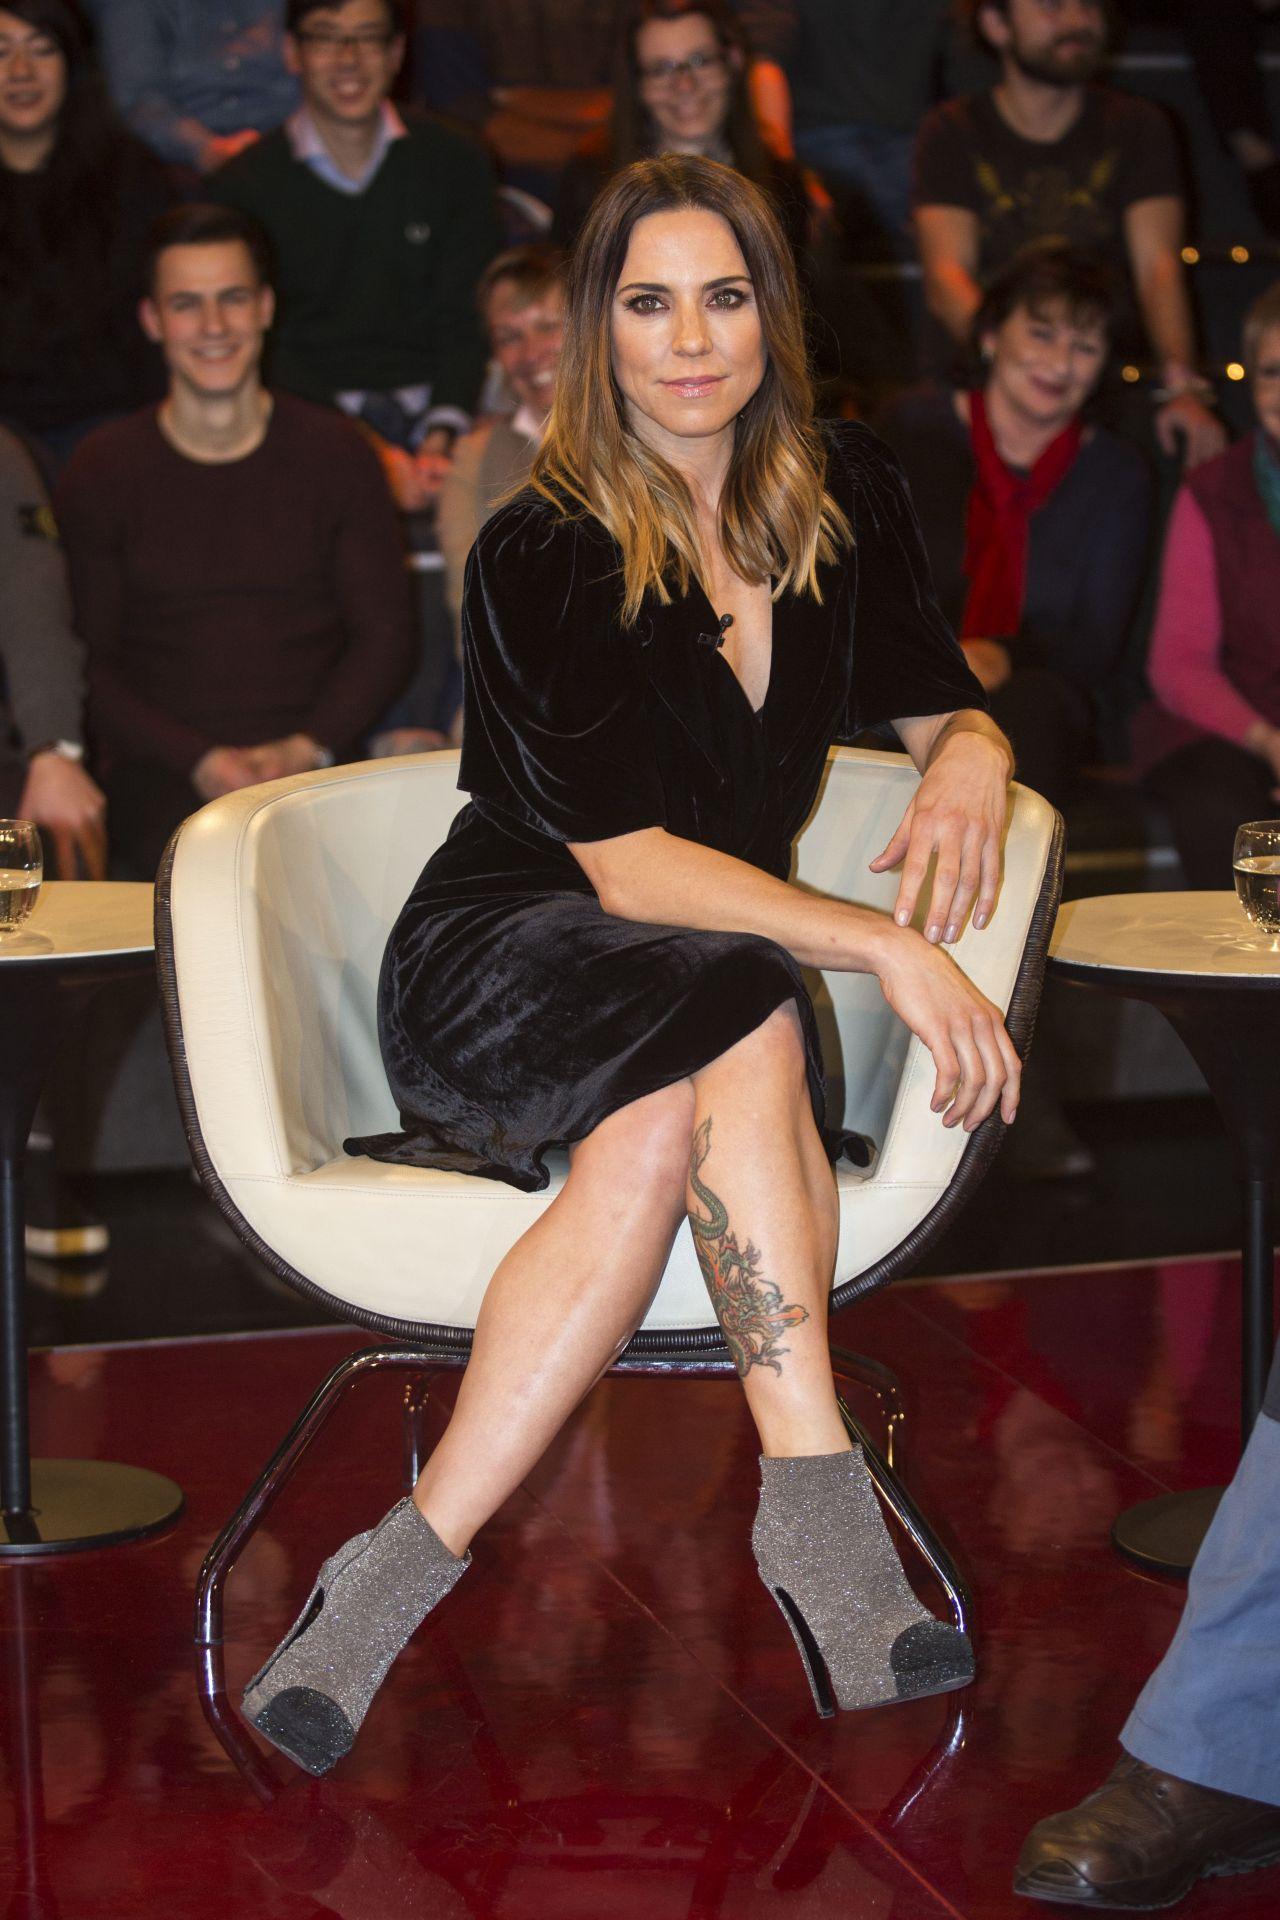 Melanie Chisholm - ZDF Talkshow Markus Lanz in Hamburg, February 2017